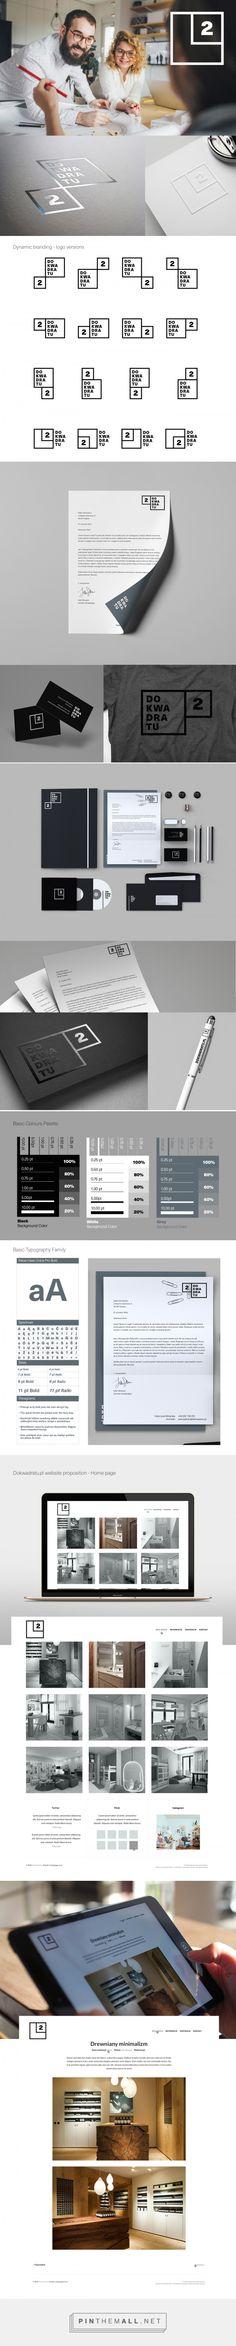 visual identity | Do Kwadratu Branding by Lukasz KuIakowski